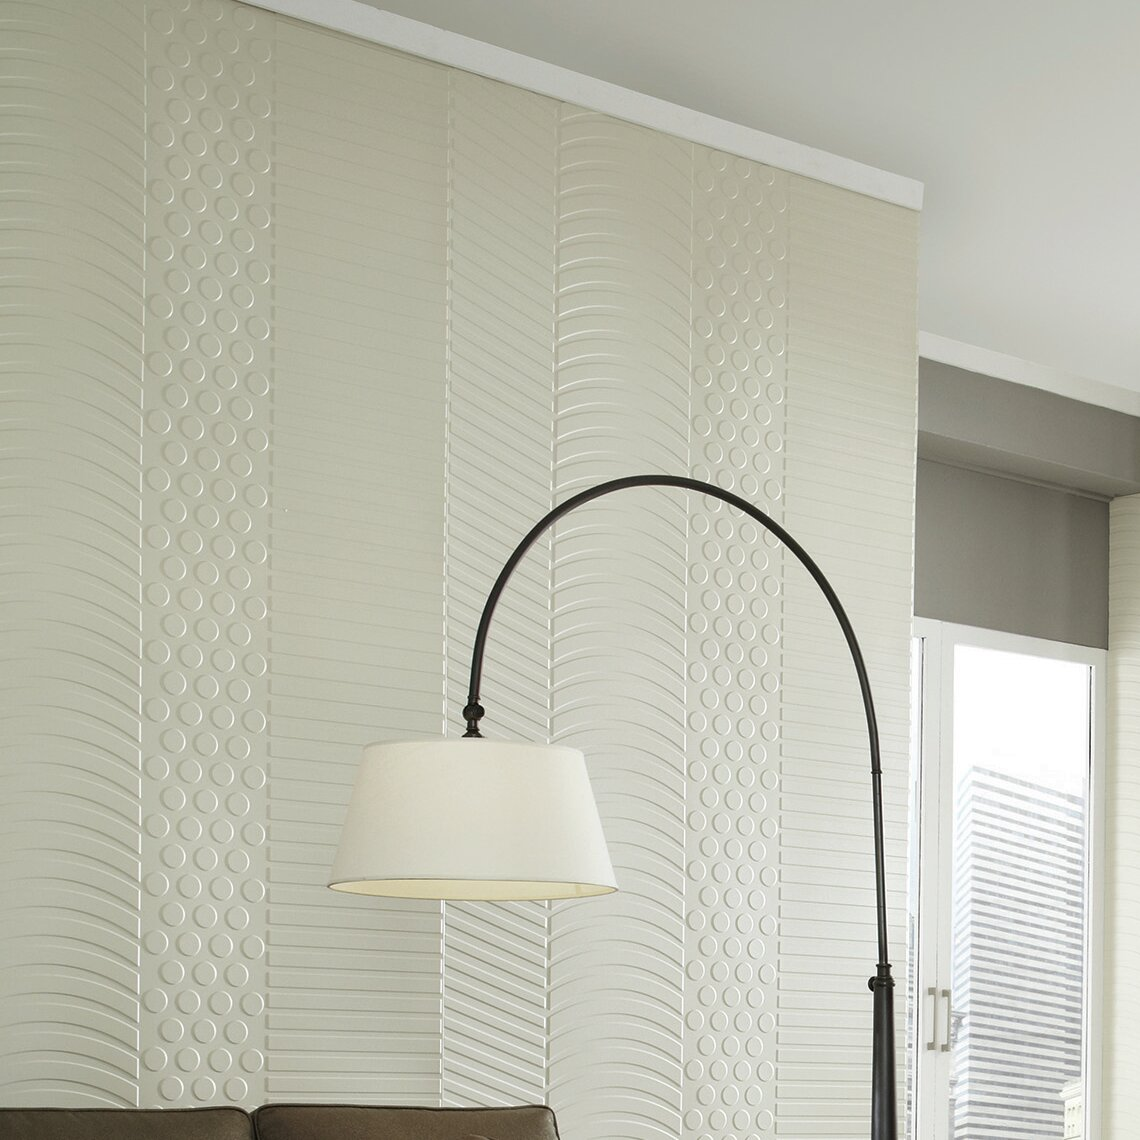 Ripple Horizontal Almond Decorative Wall Panel 4 X 8 Panel Fast And